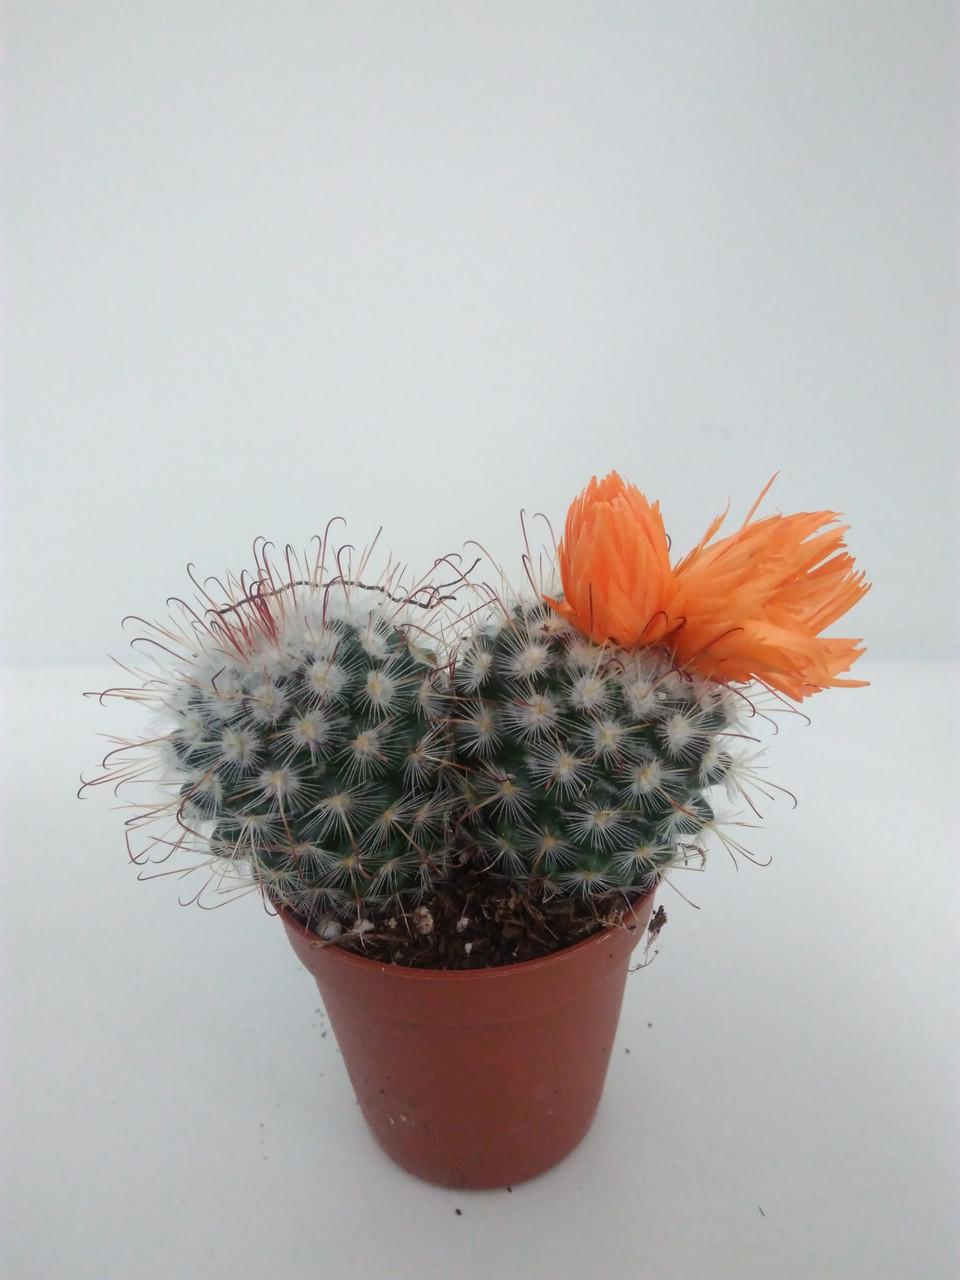 Домашние цветы фото и название кактусов